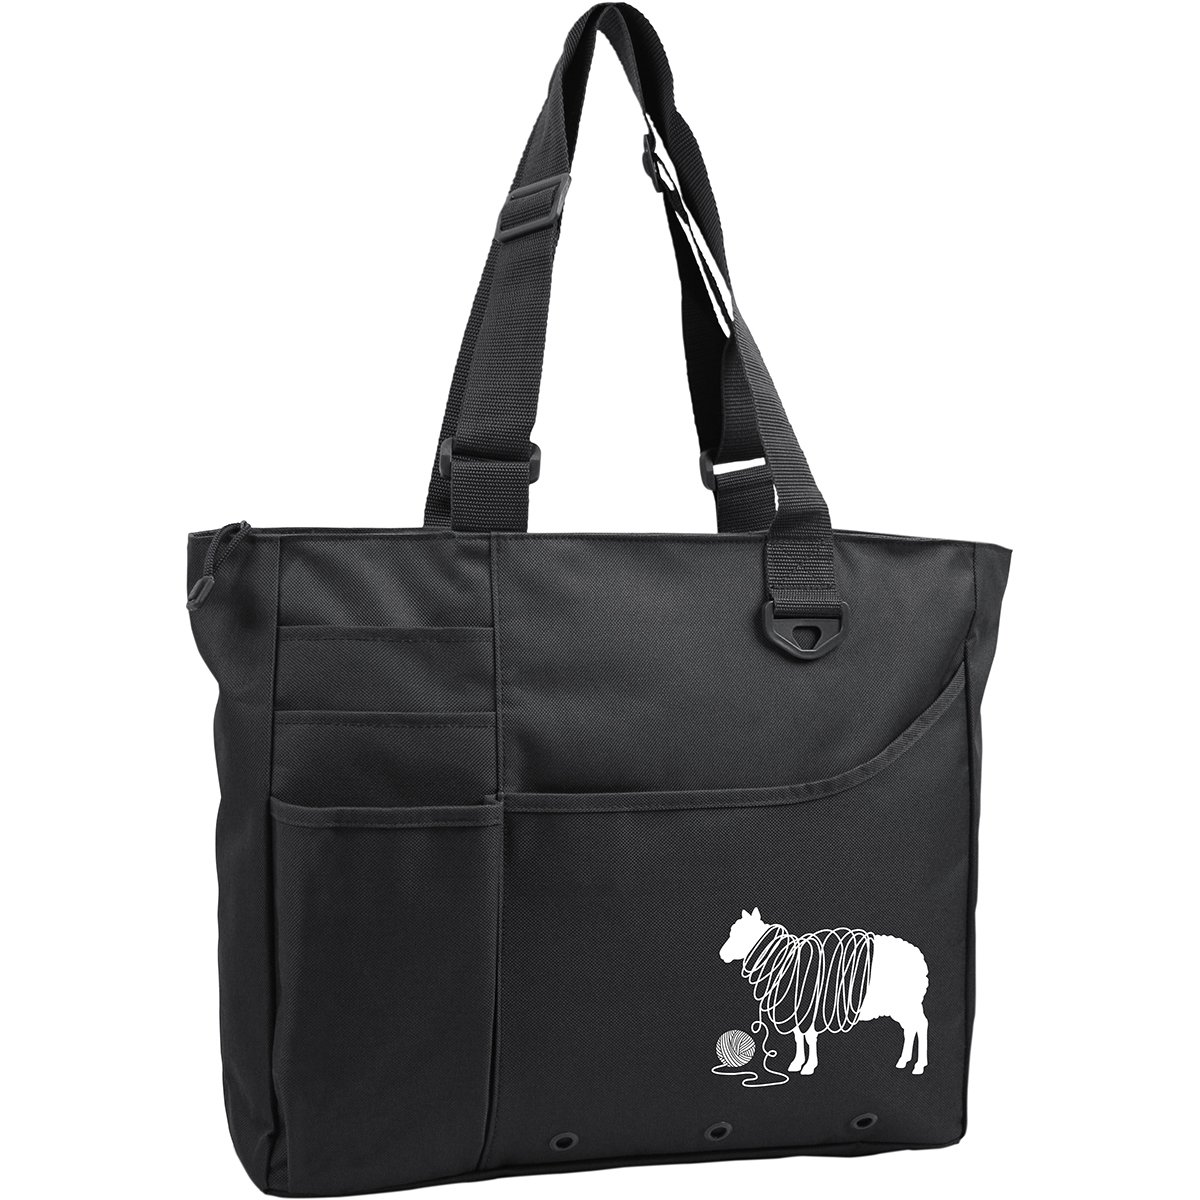 Knit Happy Unwound Sheep Bright Bag 15X13X4-Black K1C2 KH212-BA